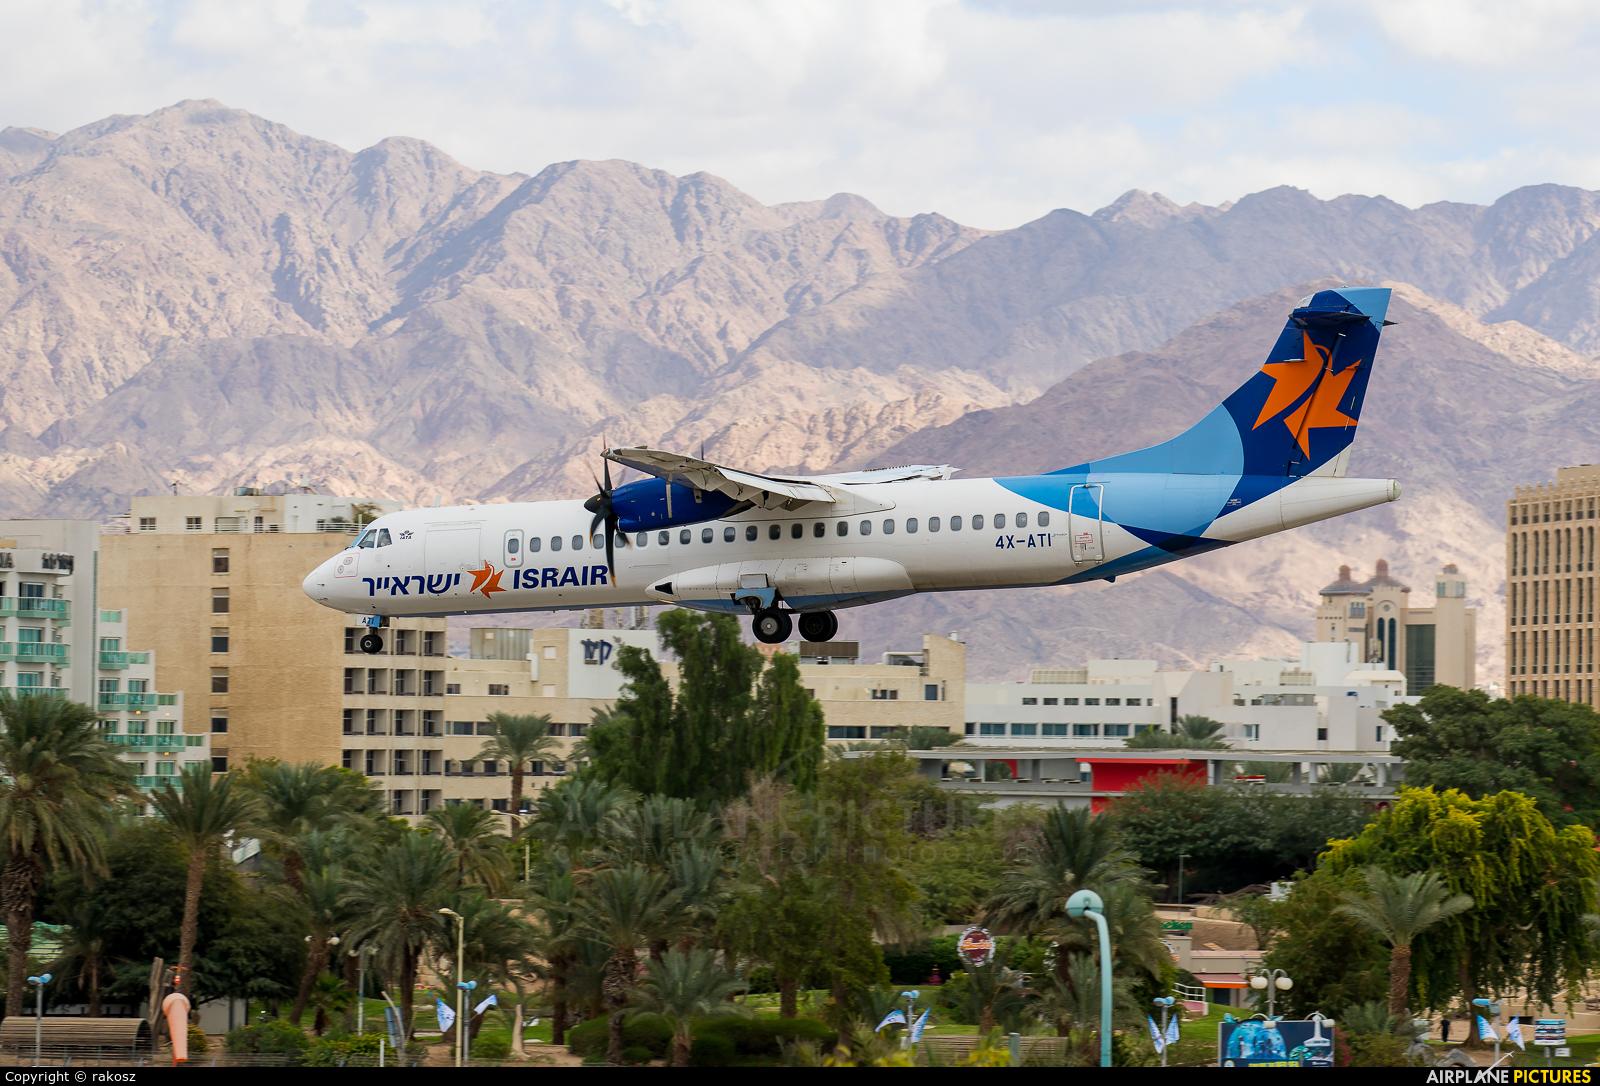 Israir Airlines 4X-ATI aircraft at Eilat - J. Hozman